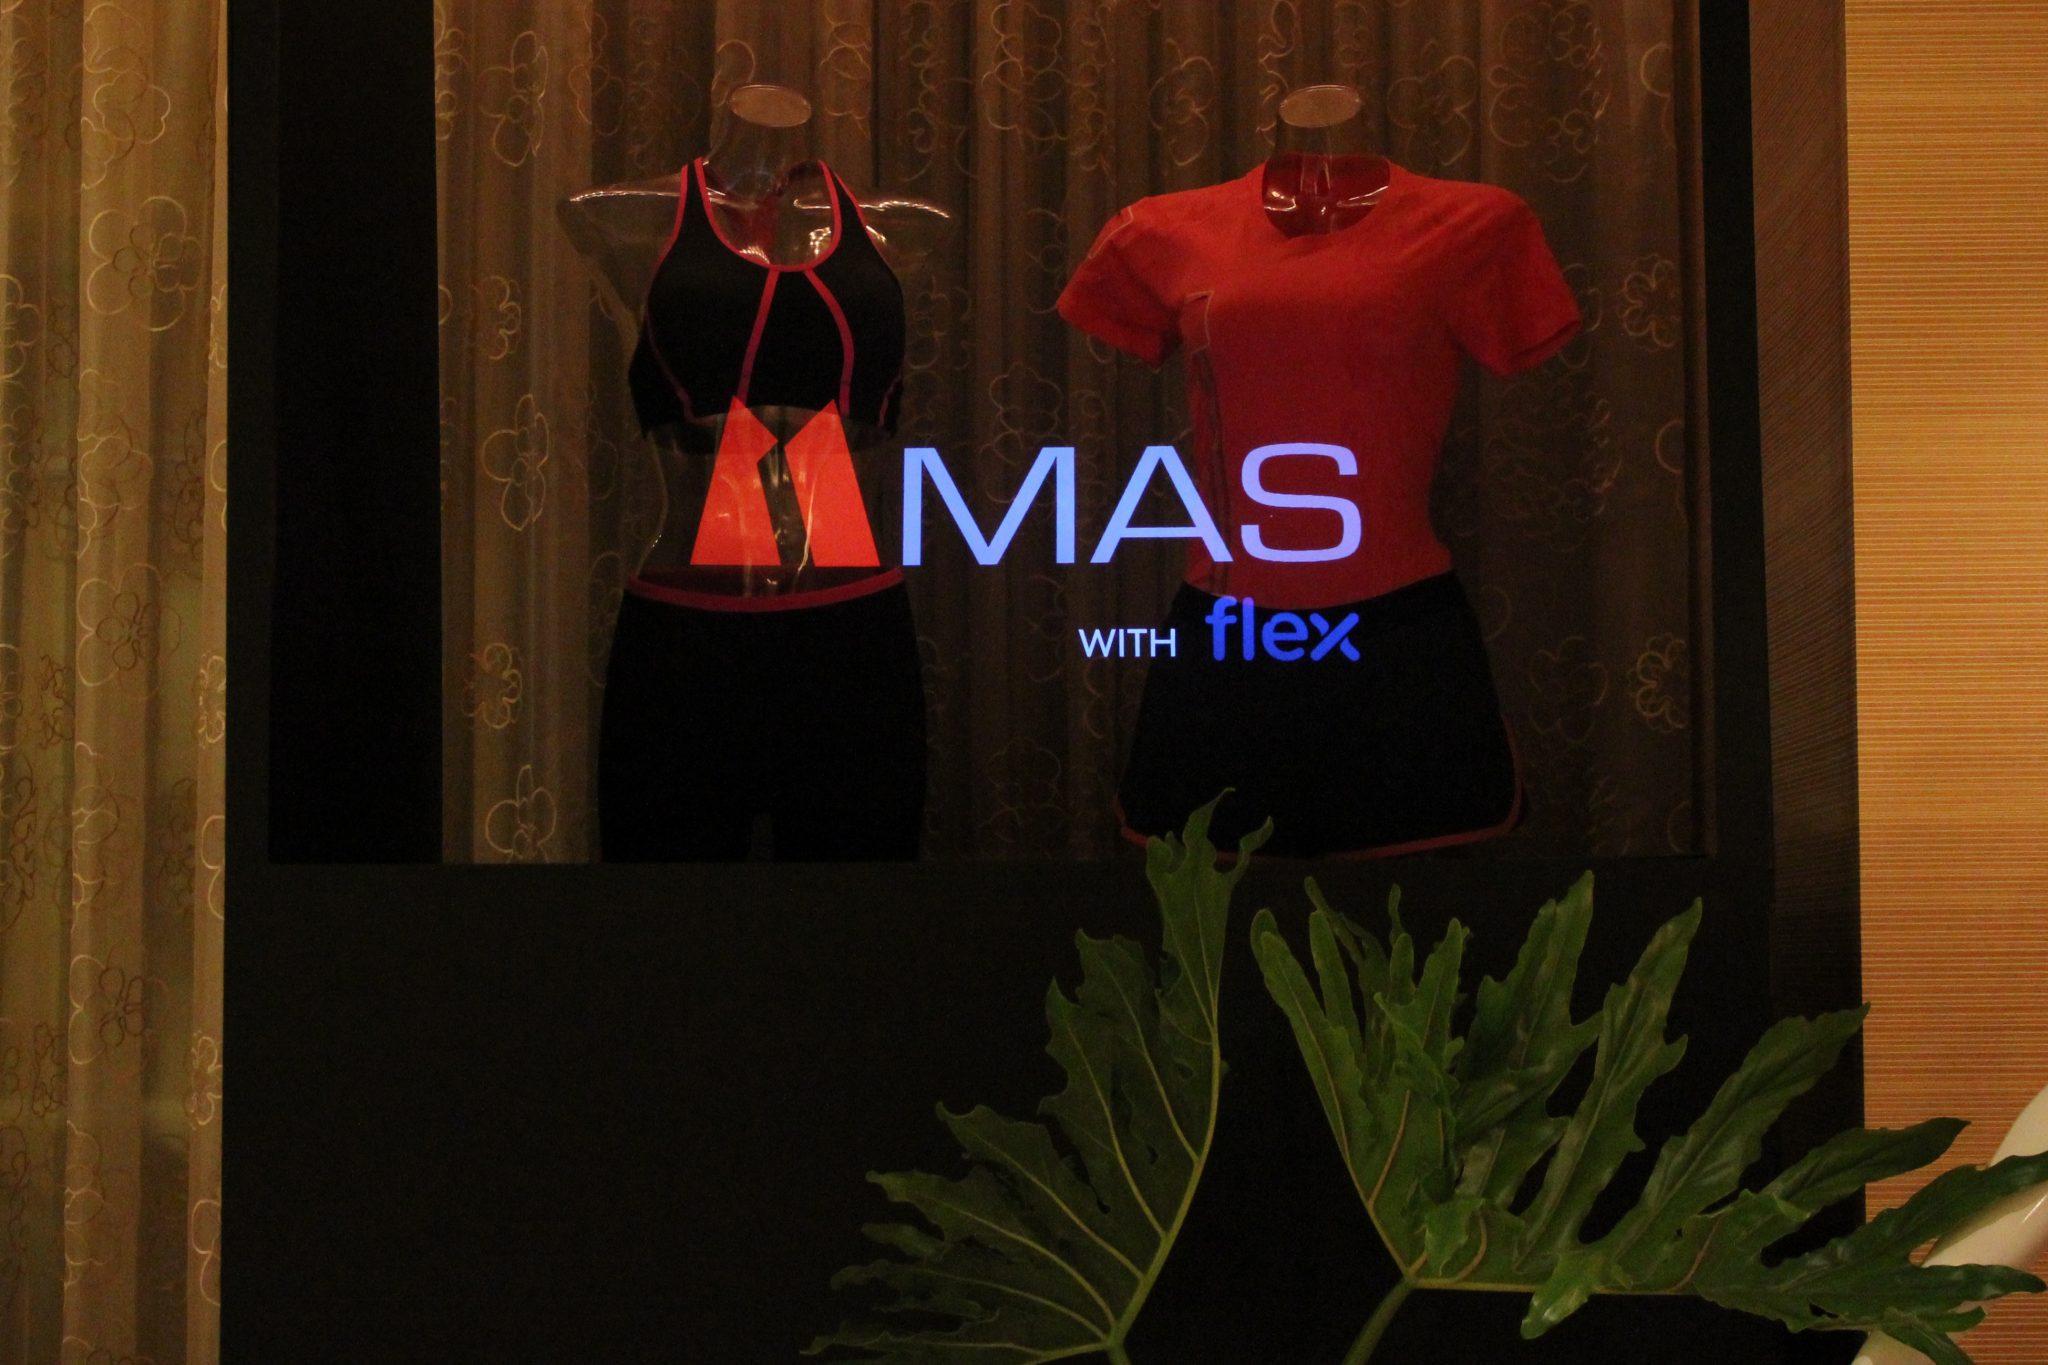 CES 2016 - Refinery 29 suite - Mas Holdings with Flex